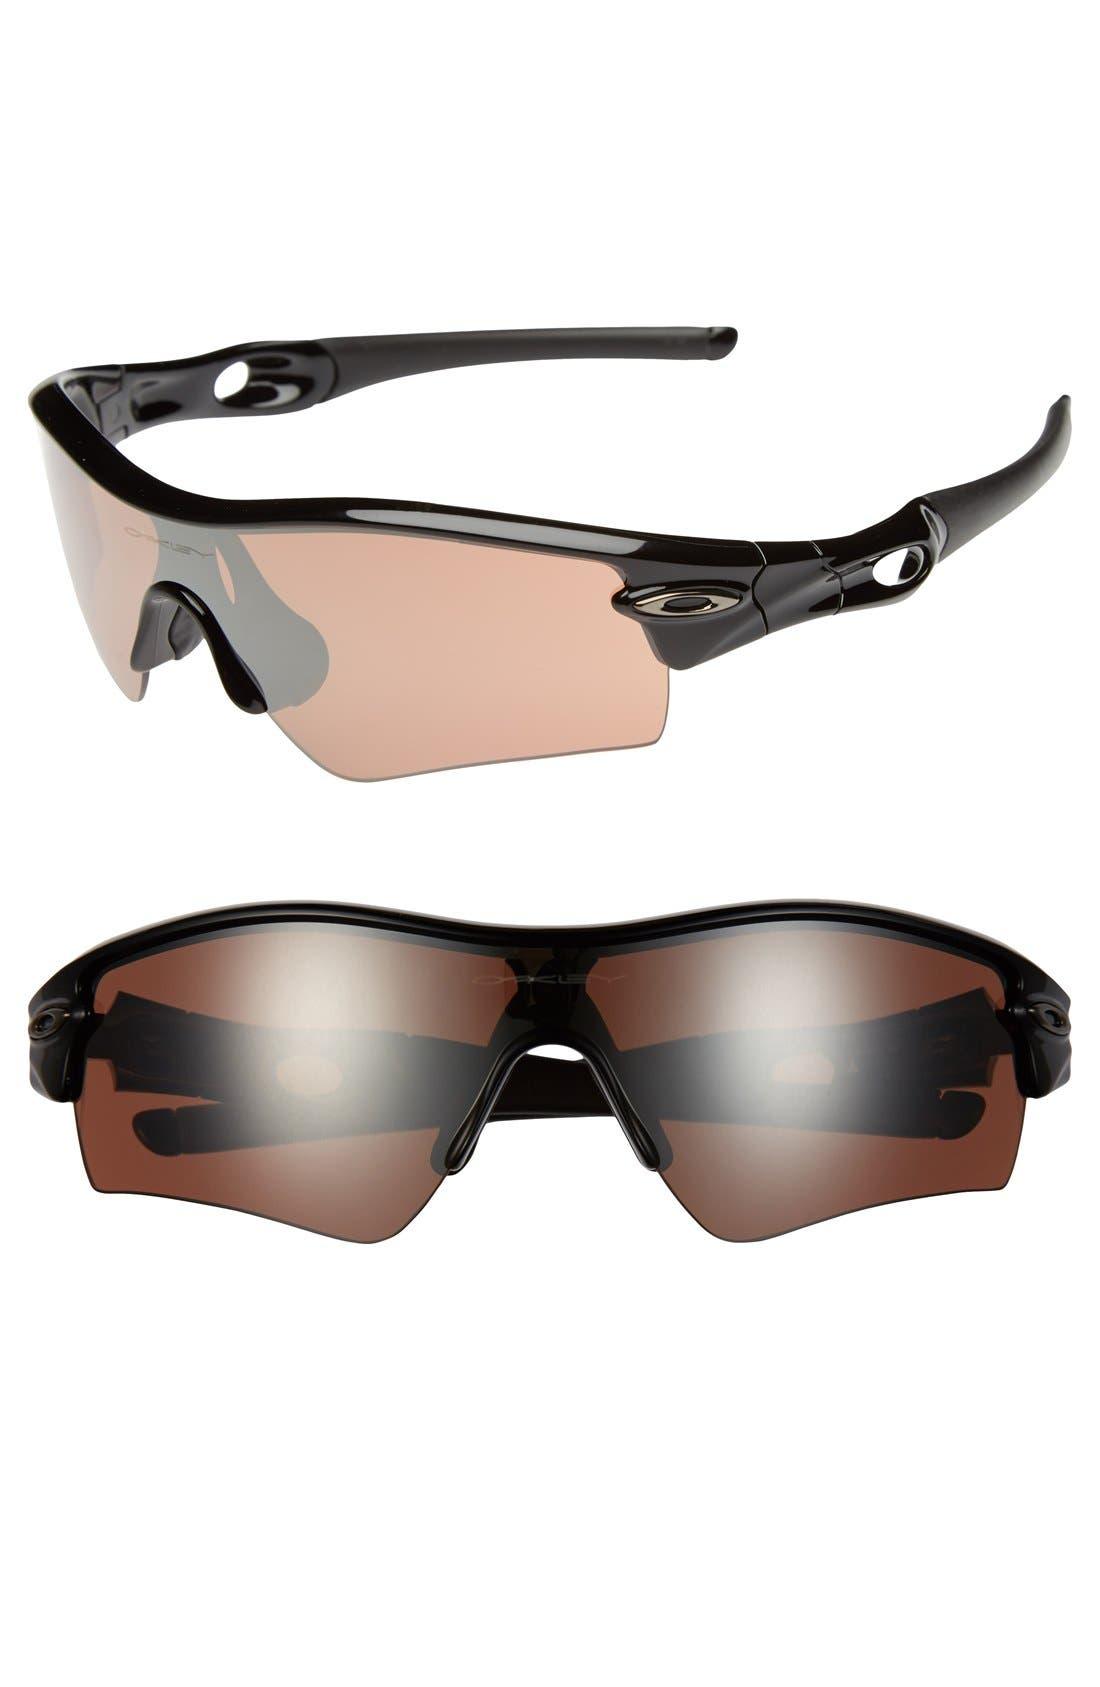 Alternate Image 1 Selected - Oakley 'Radar Path' 155mm Shield Sunglasses